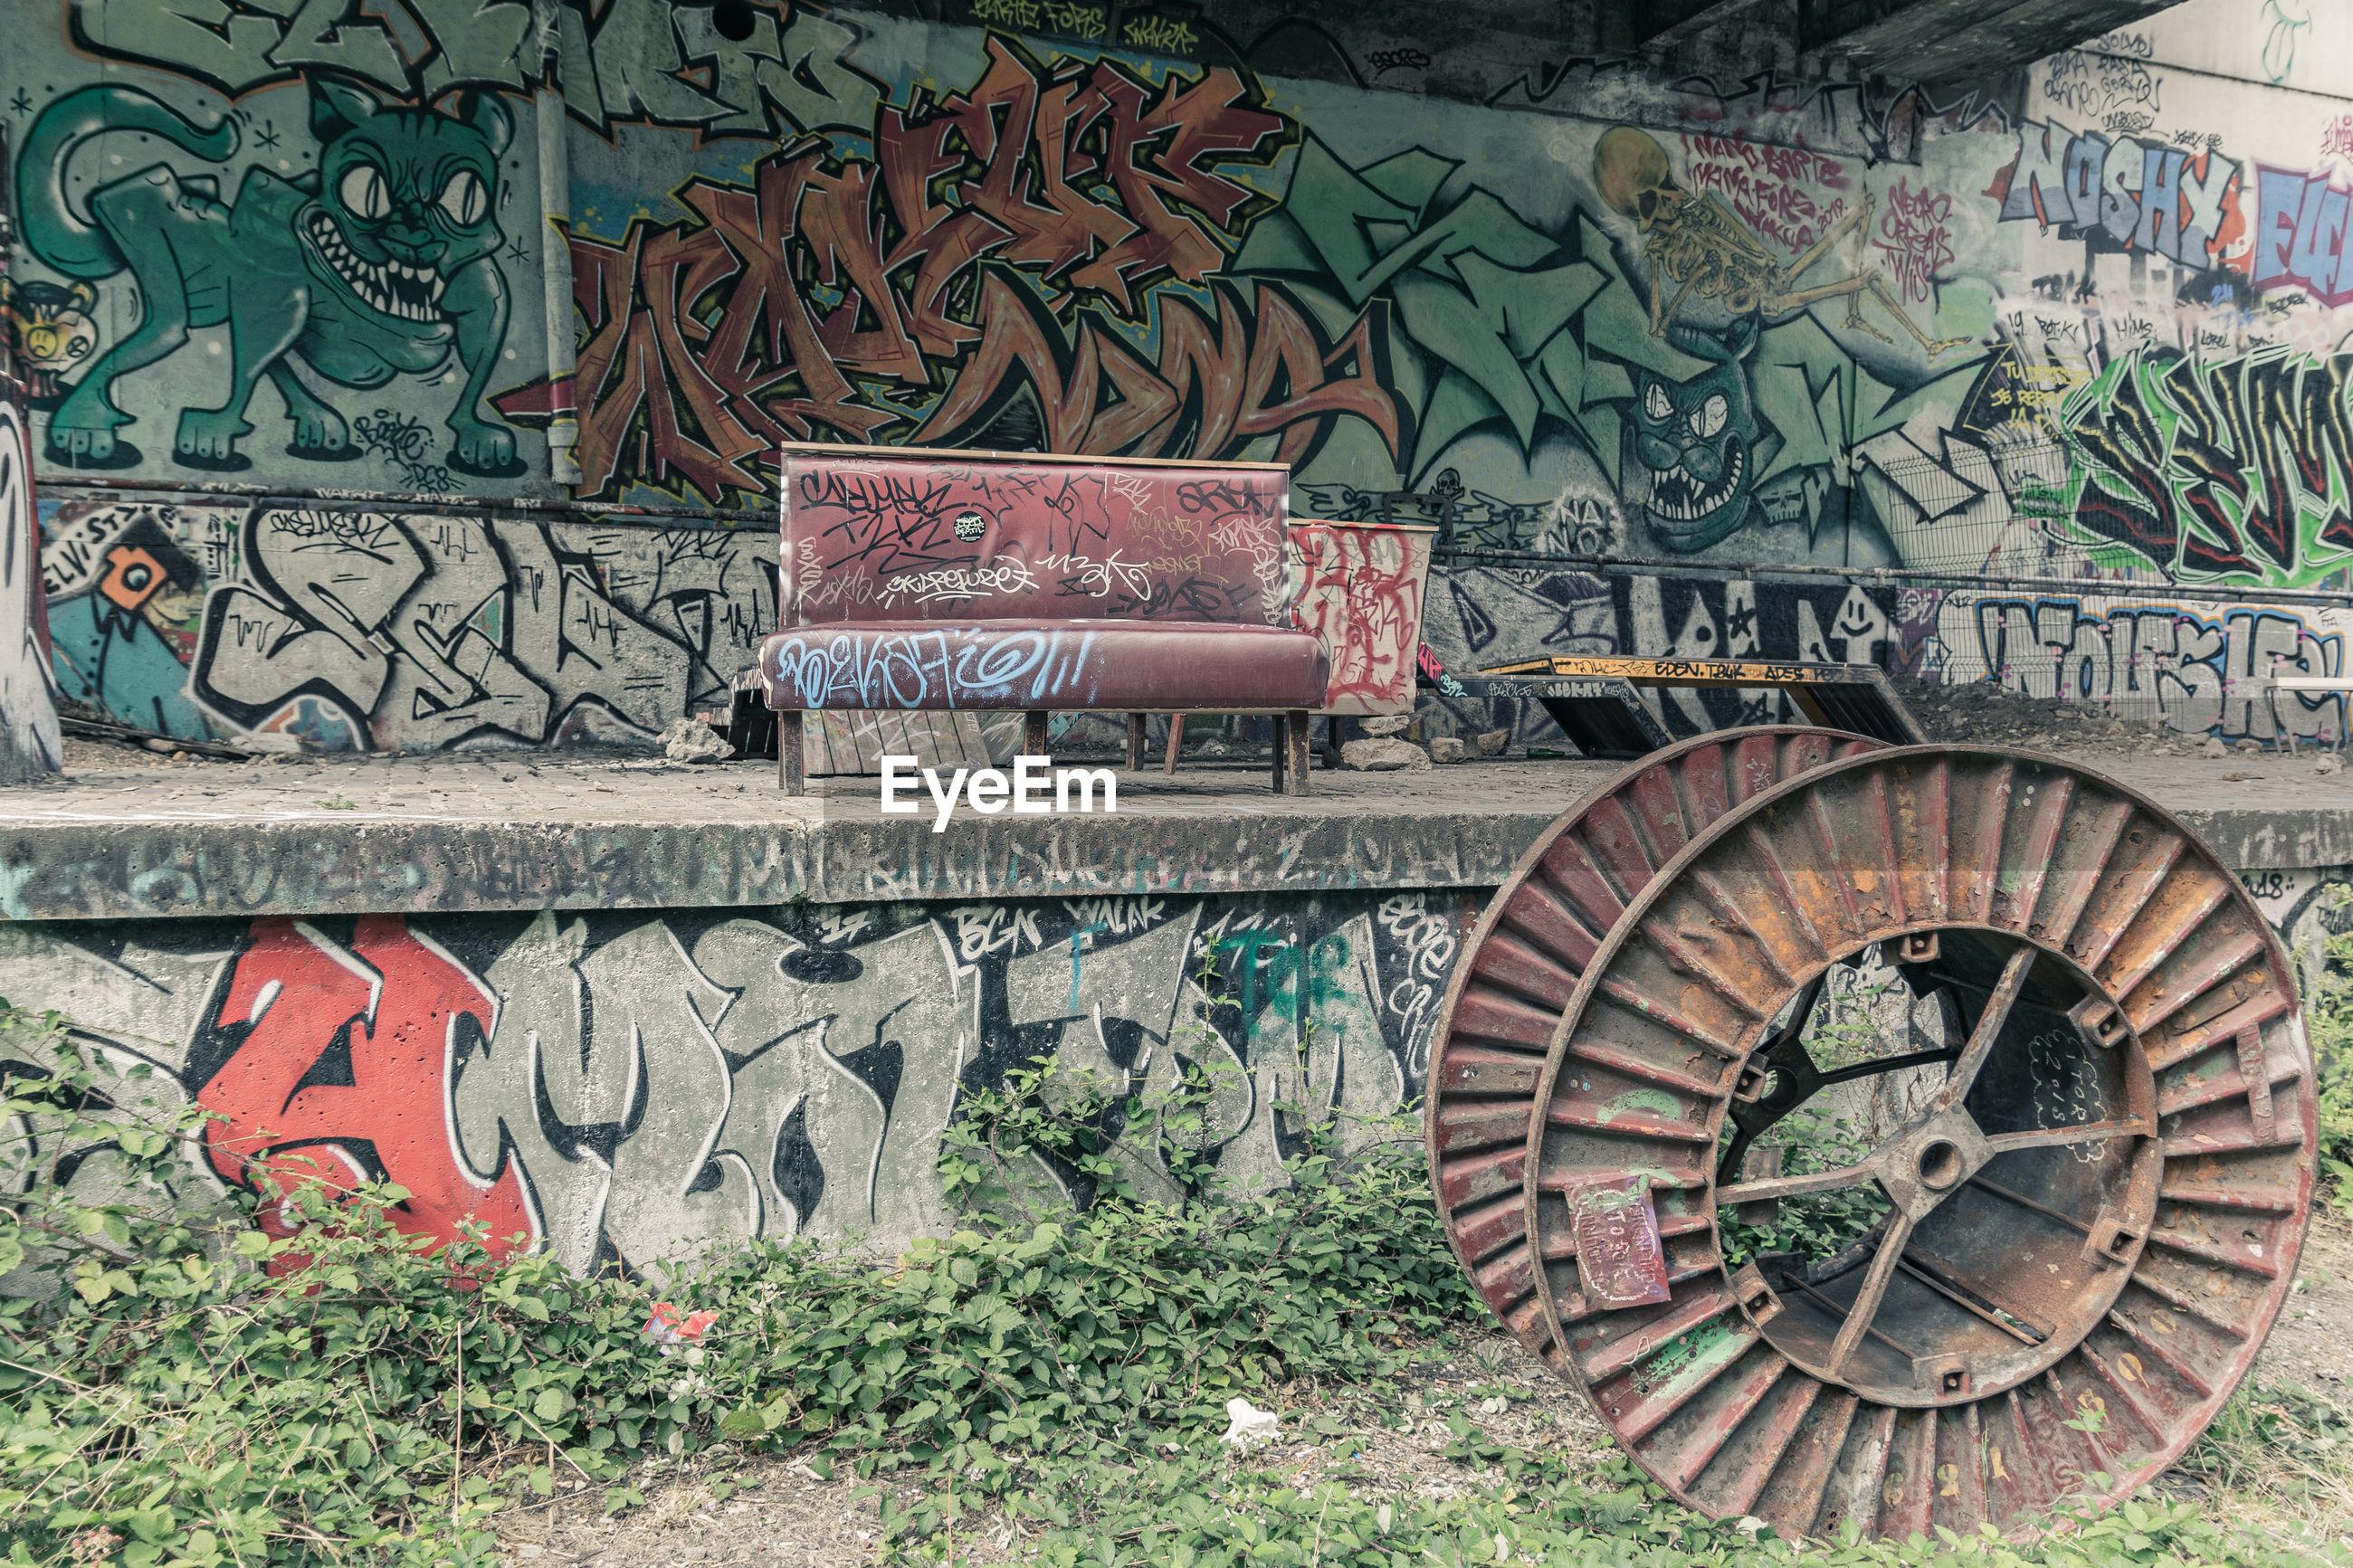 GRAFFITI ON WALL OF OLD WALLS